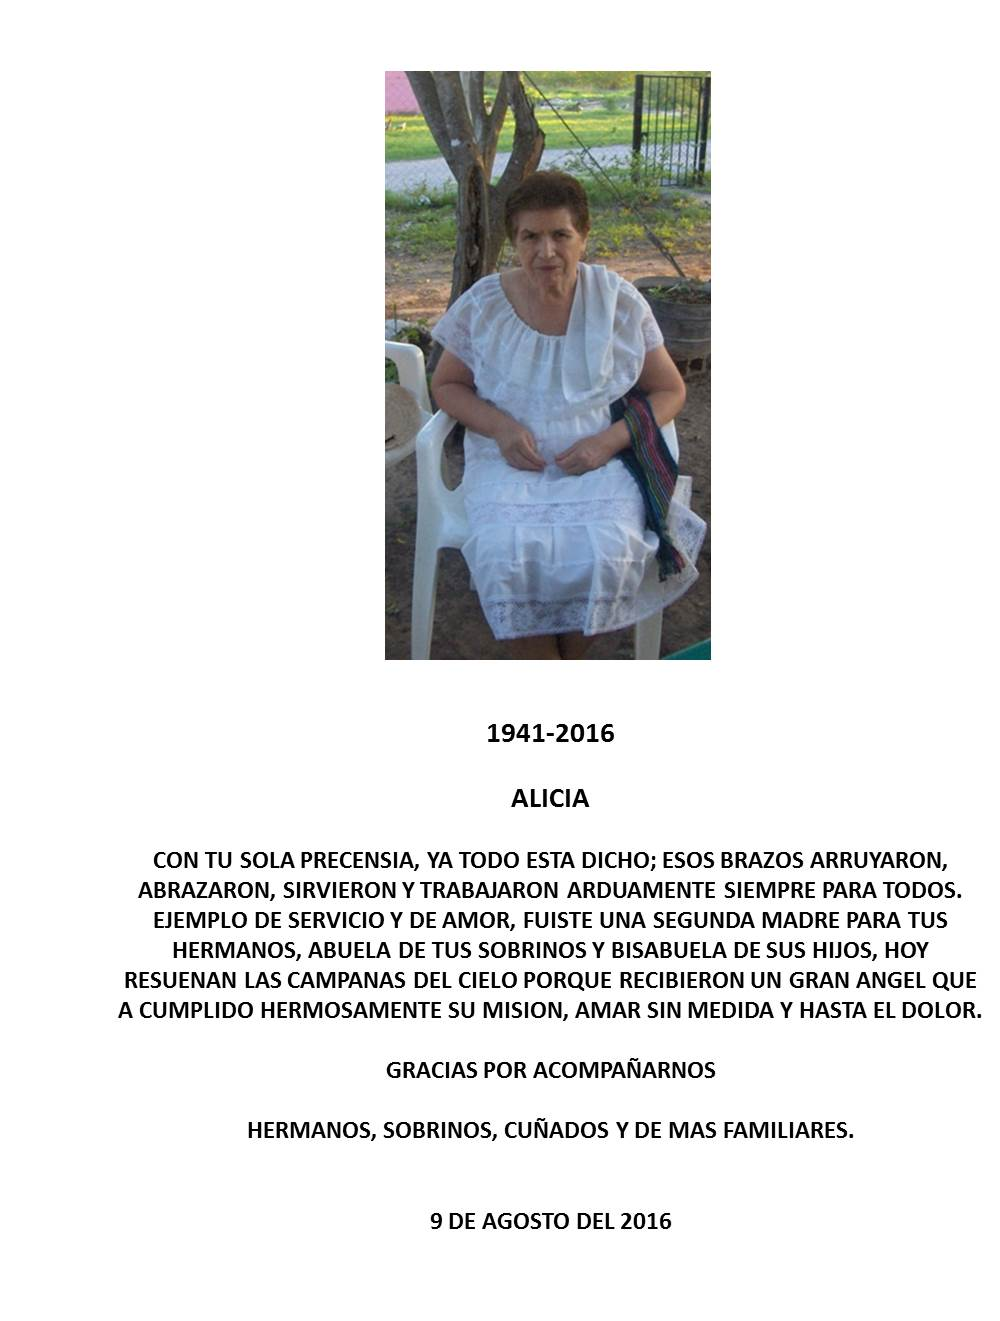 Alicia de León